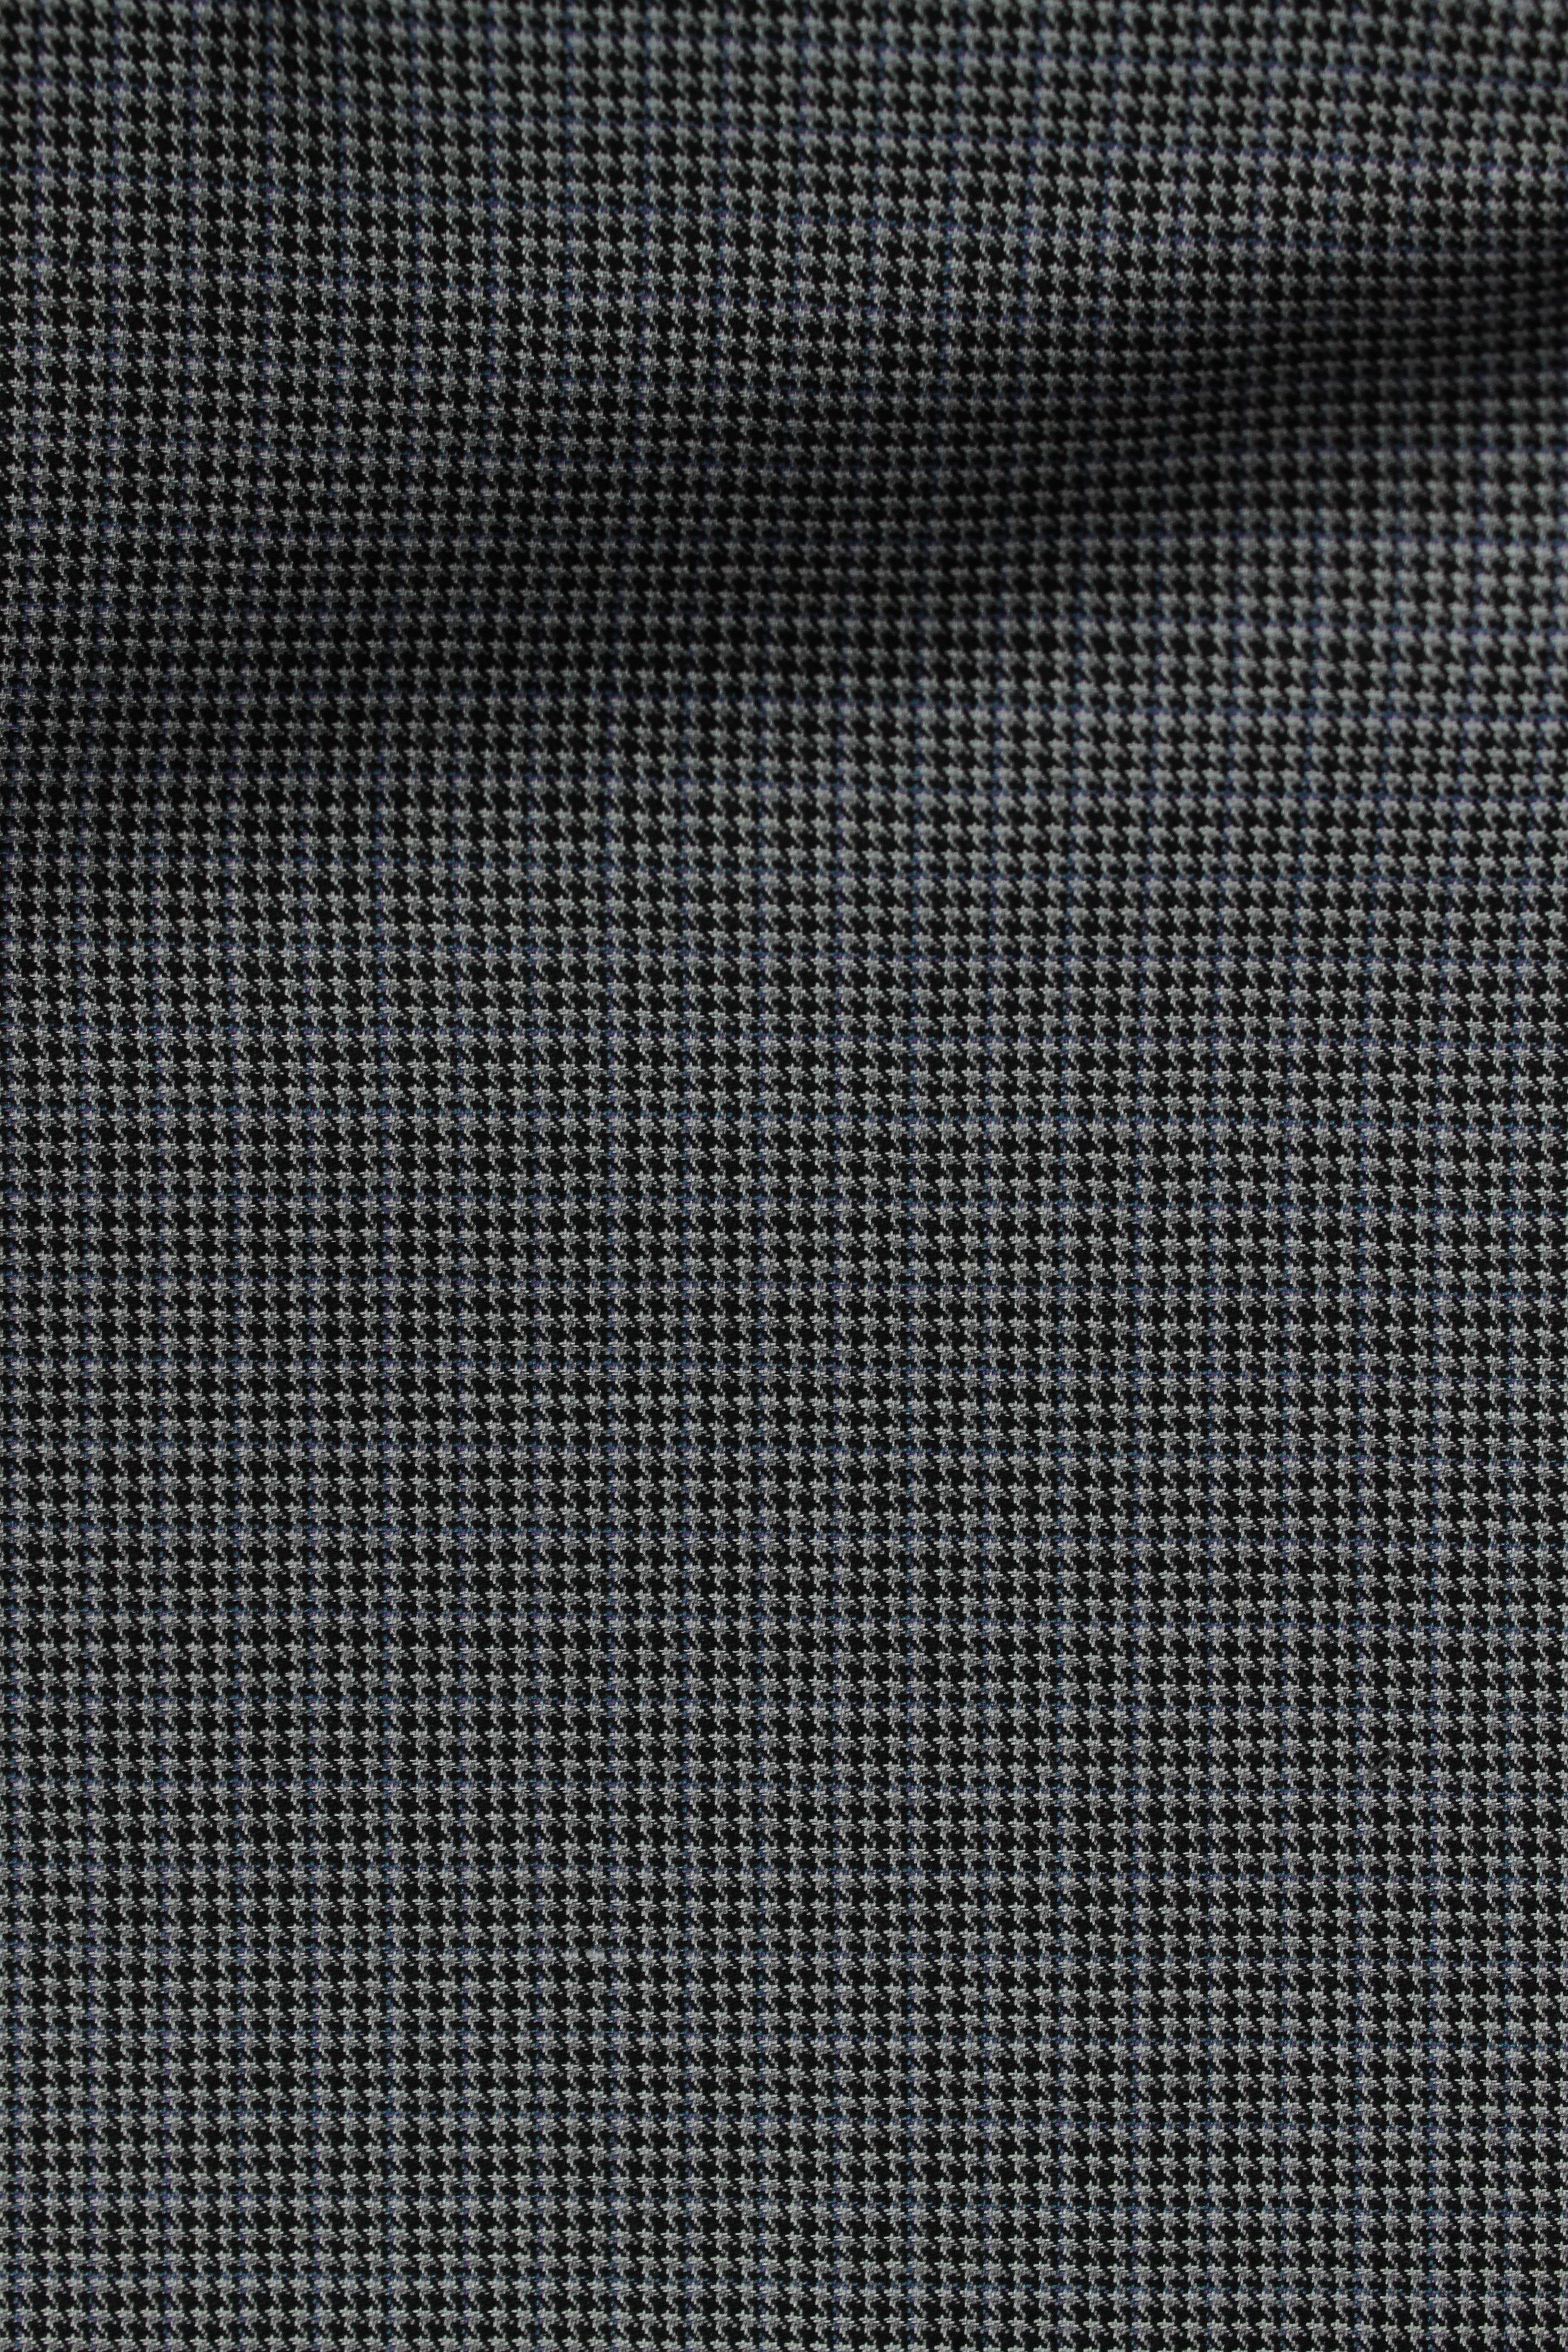 7290 Grey Micro Houndstooth 280g.JPG